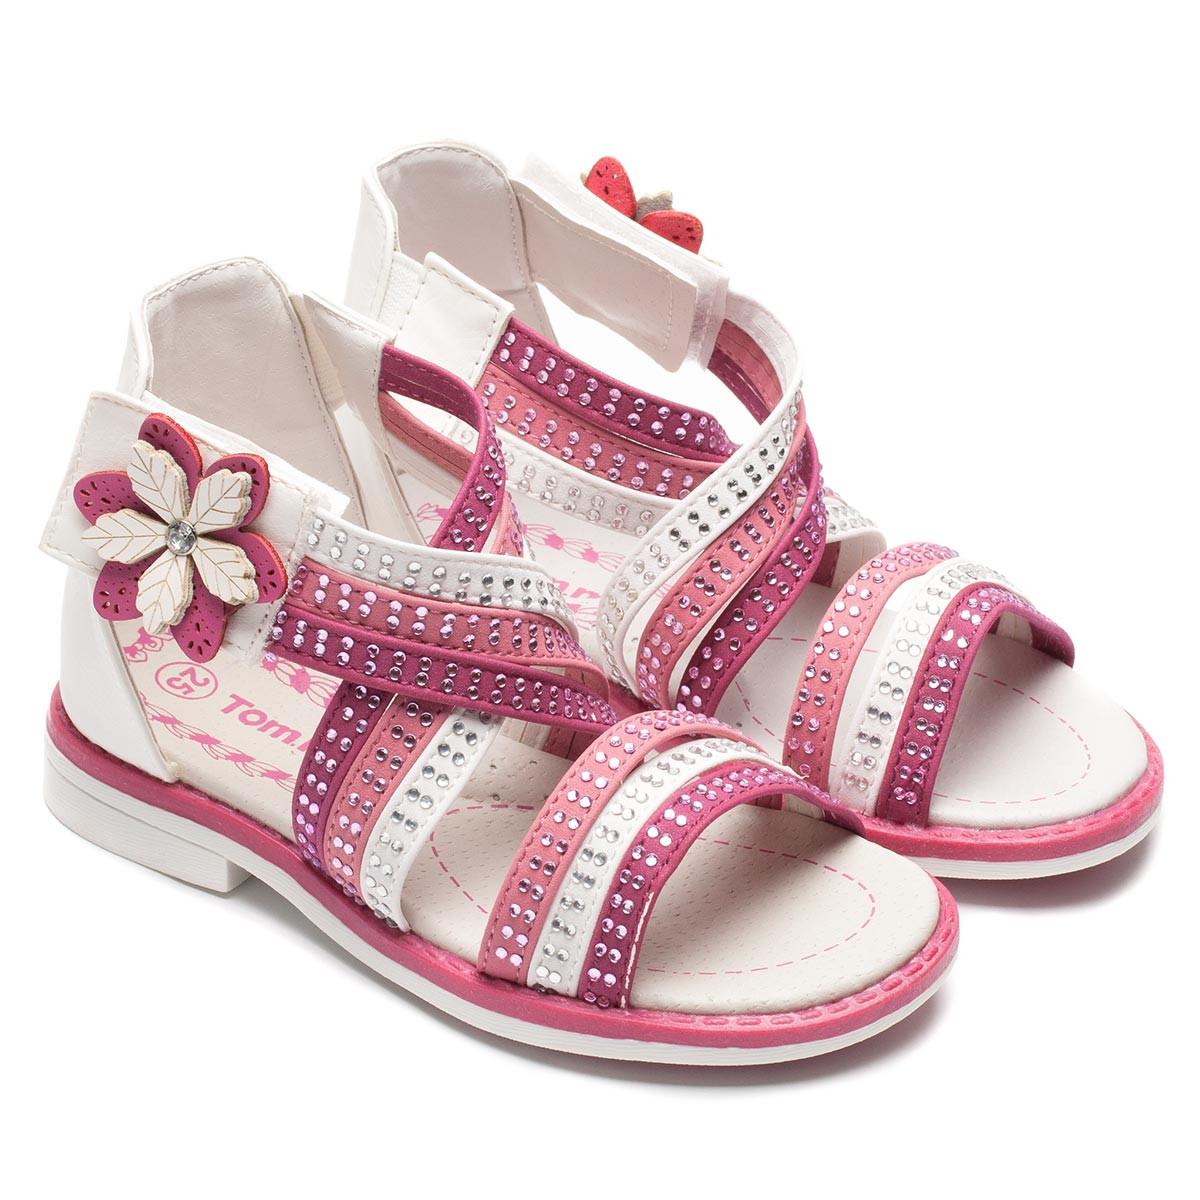 Сандалики для девочки, размер 25-30 Подробнее: http://ortopedic.com.ua/p97432055-sandaliki-dlya-devochki.html